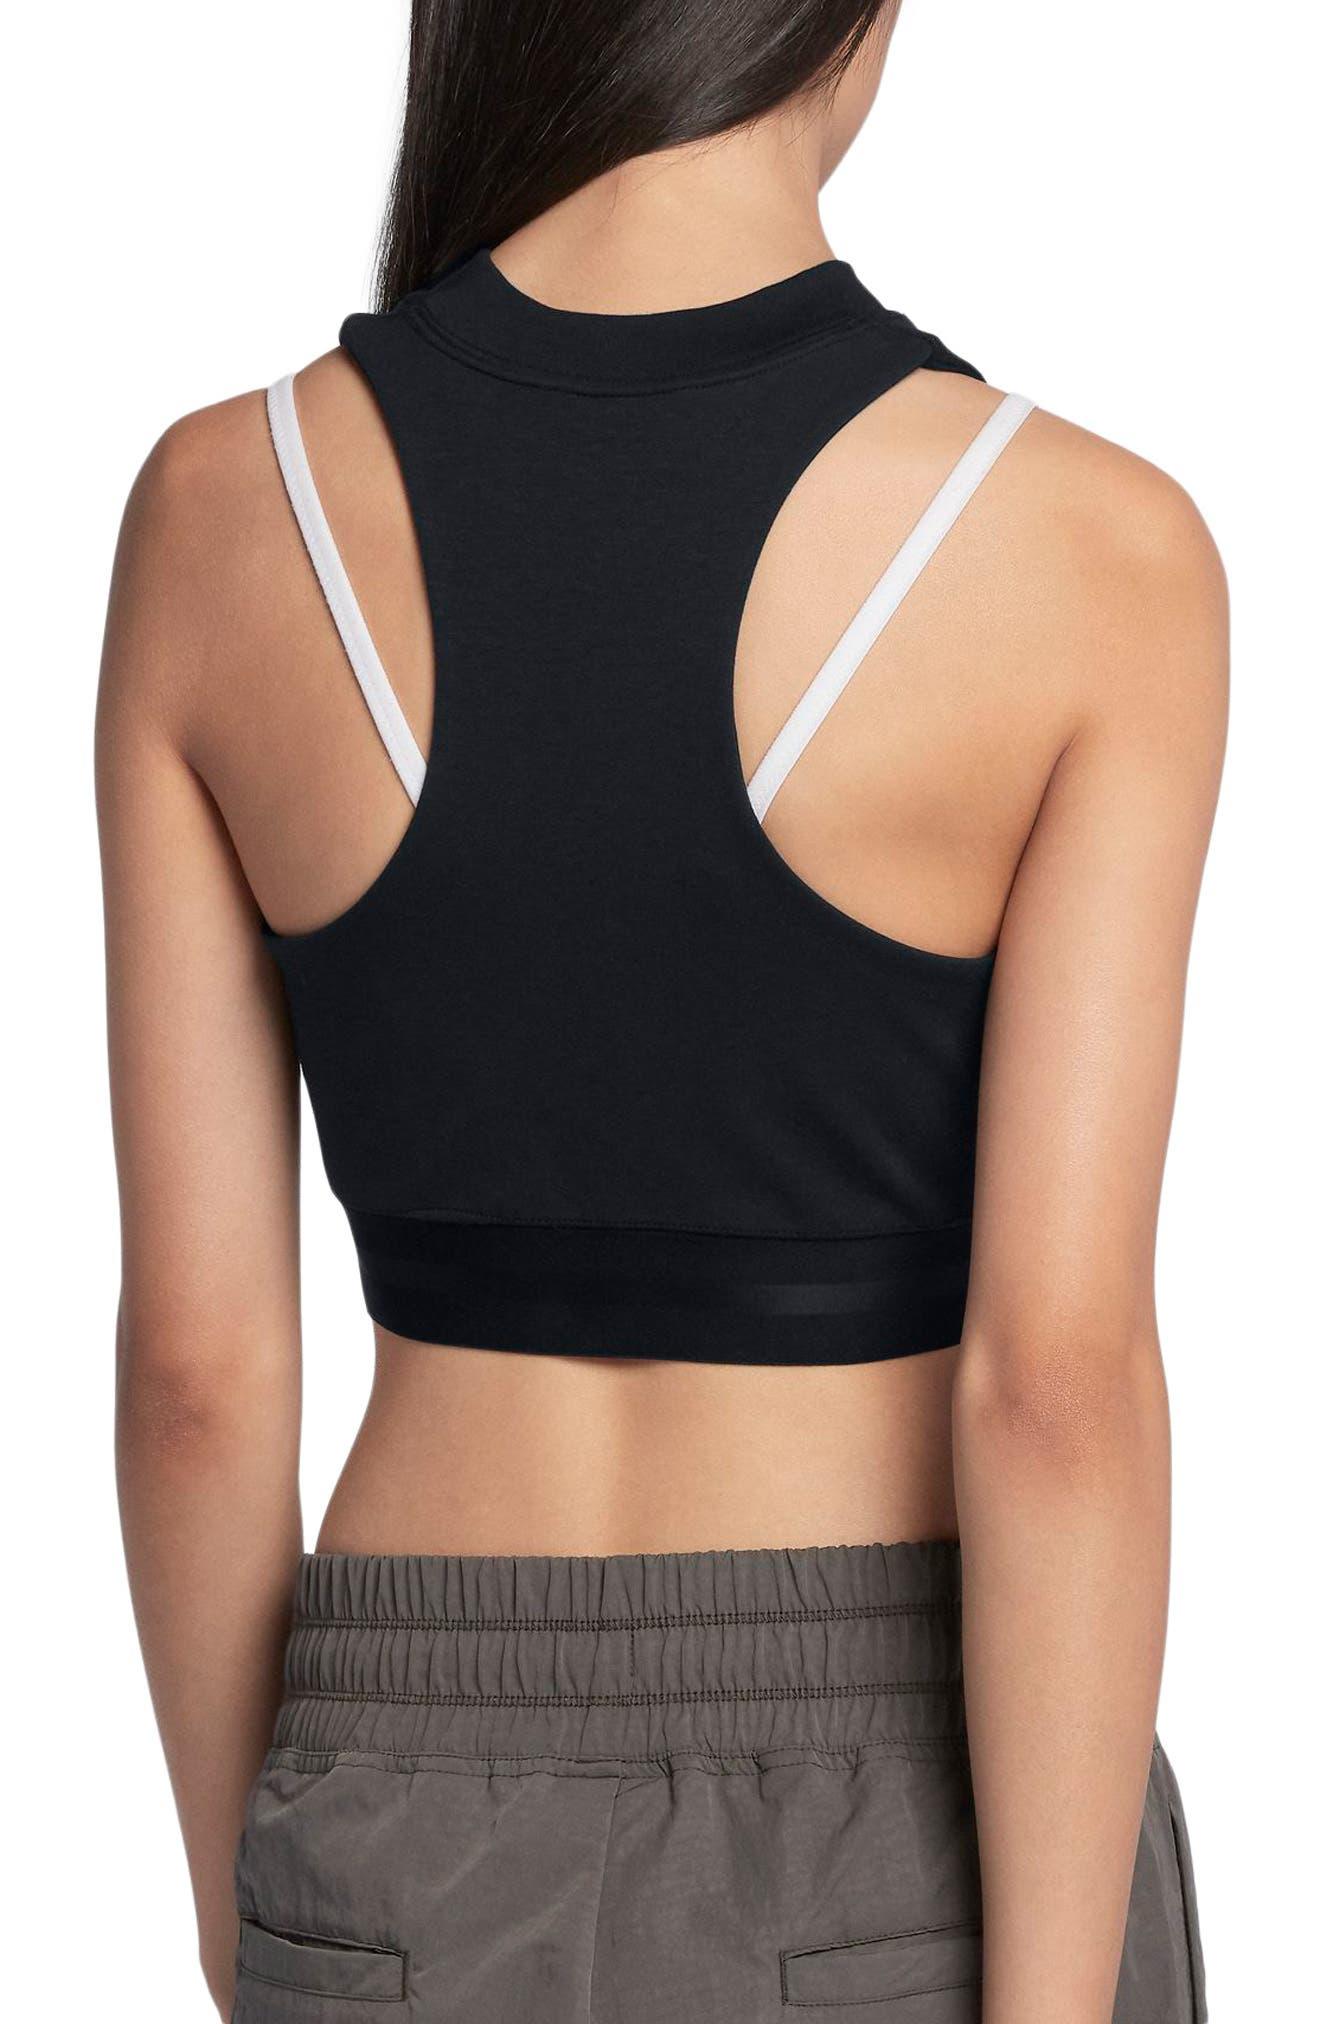 Sportswear Air Women's Crop Top,                             Alternate thumbnail 2, color,                             Black/ Black/ Black